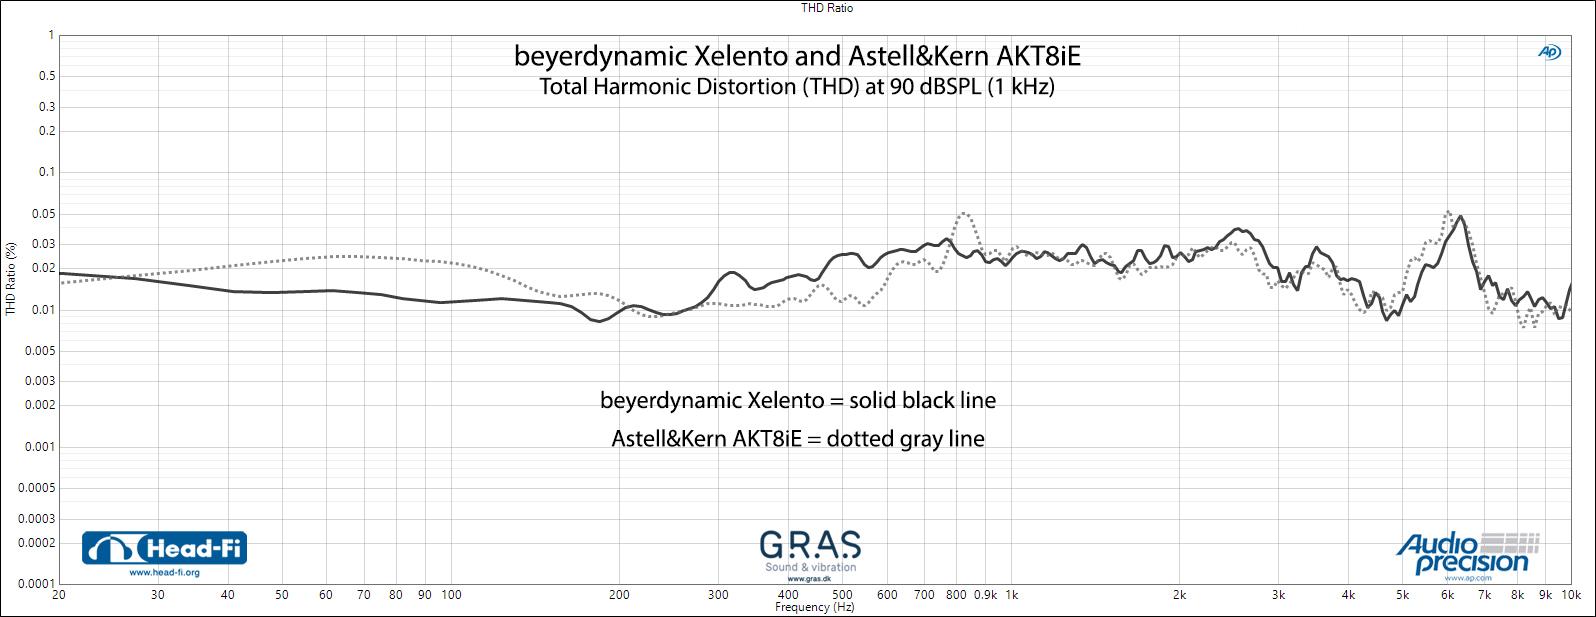 beyerdynamic-Xelento-and-Astell&Kern-AKT8iE_THD.jpg